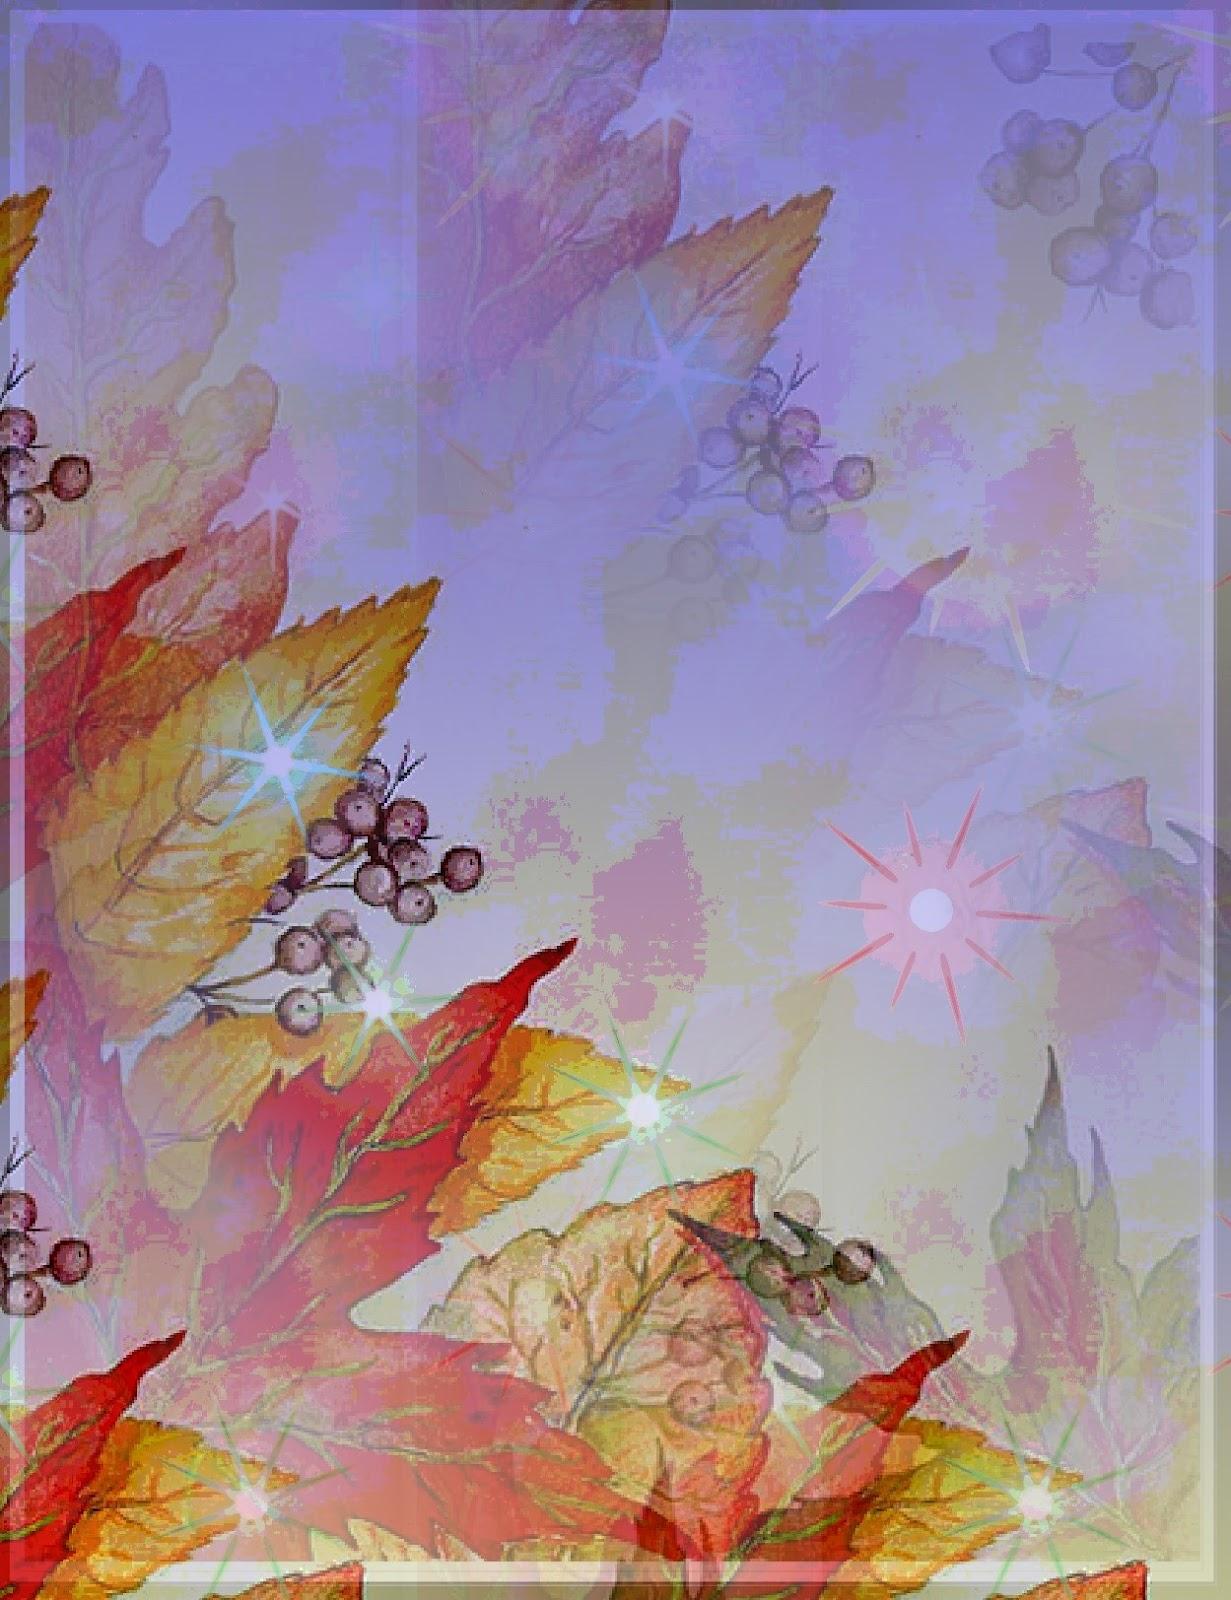 christian fall wallpaper - photo #31